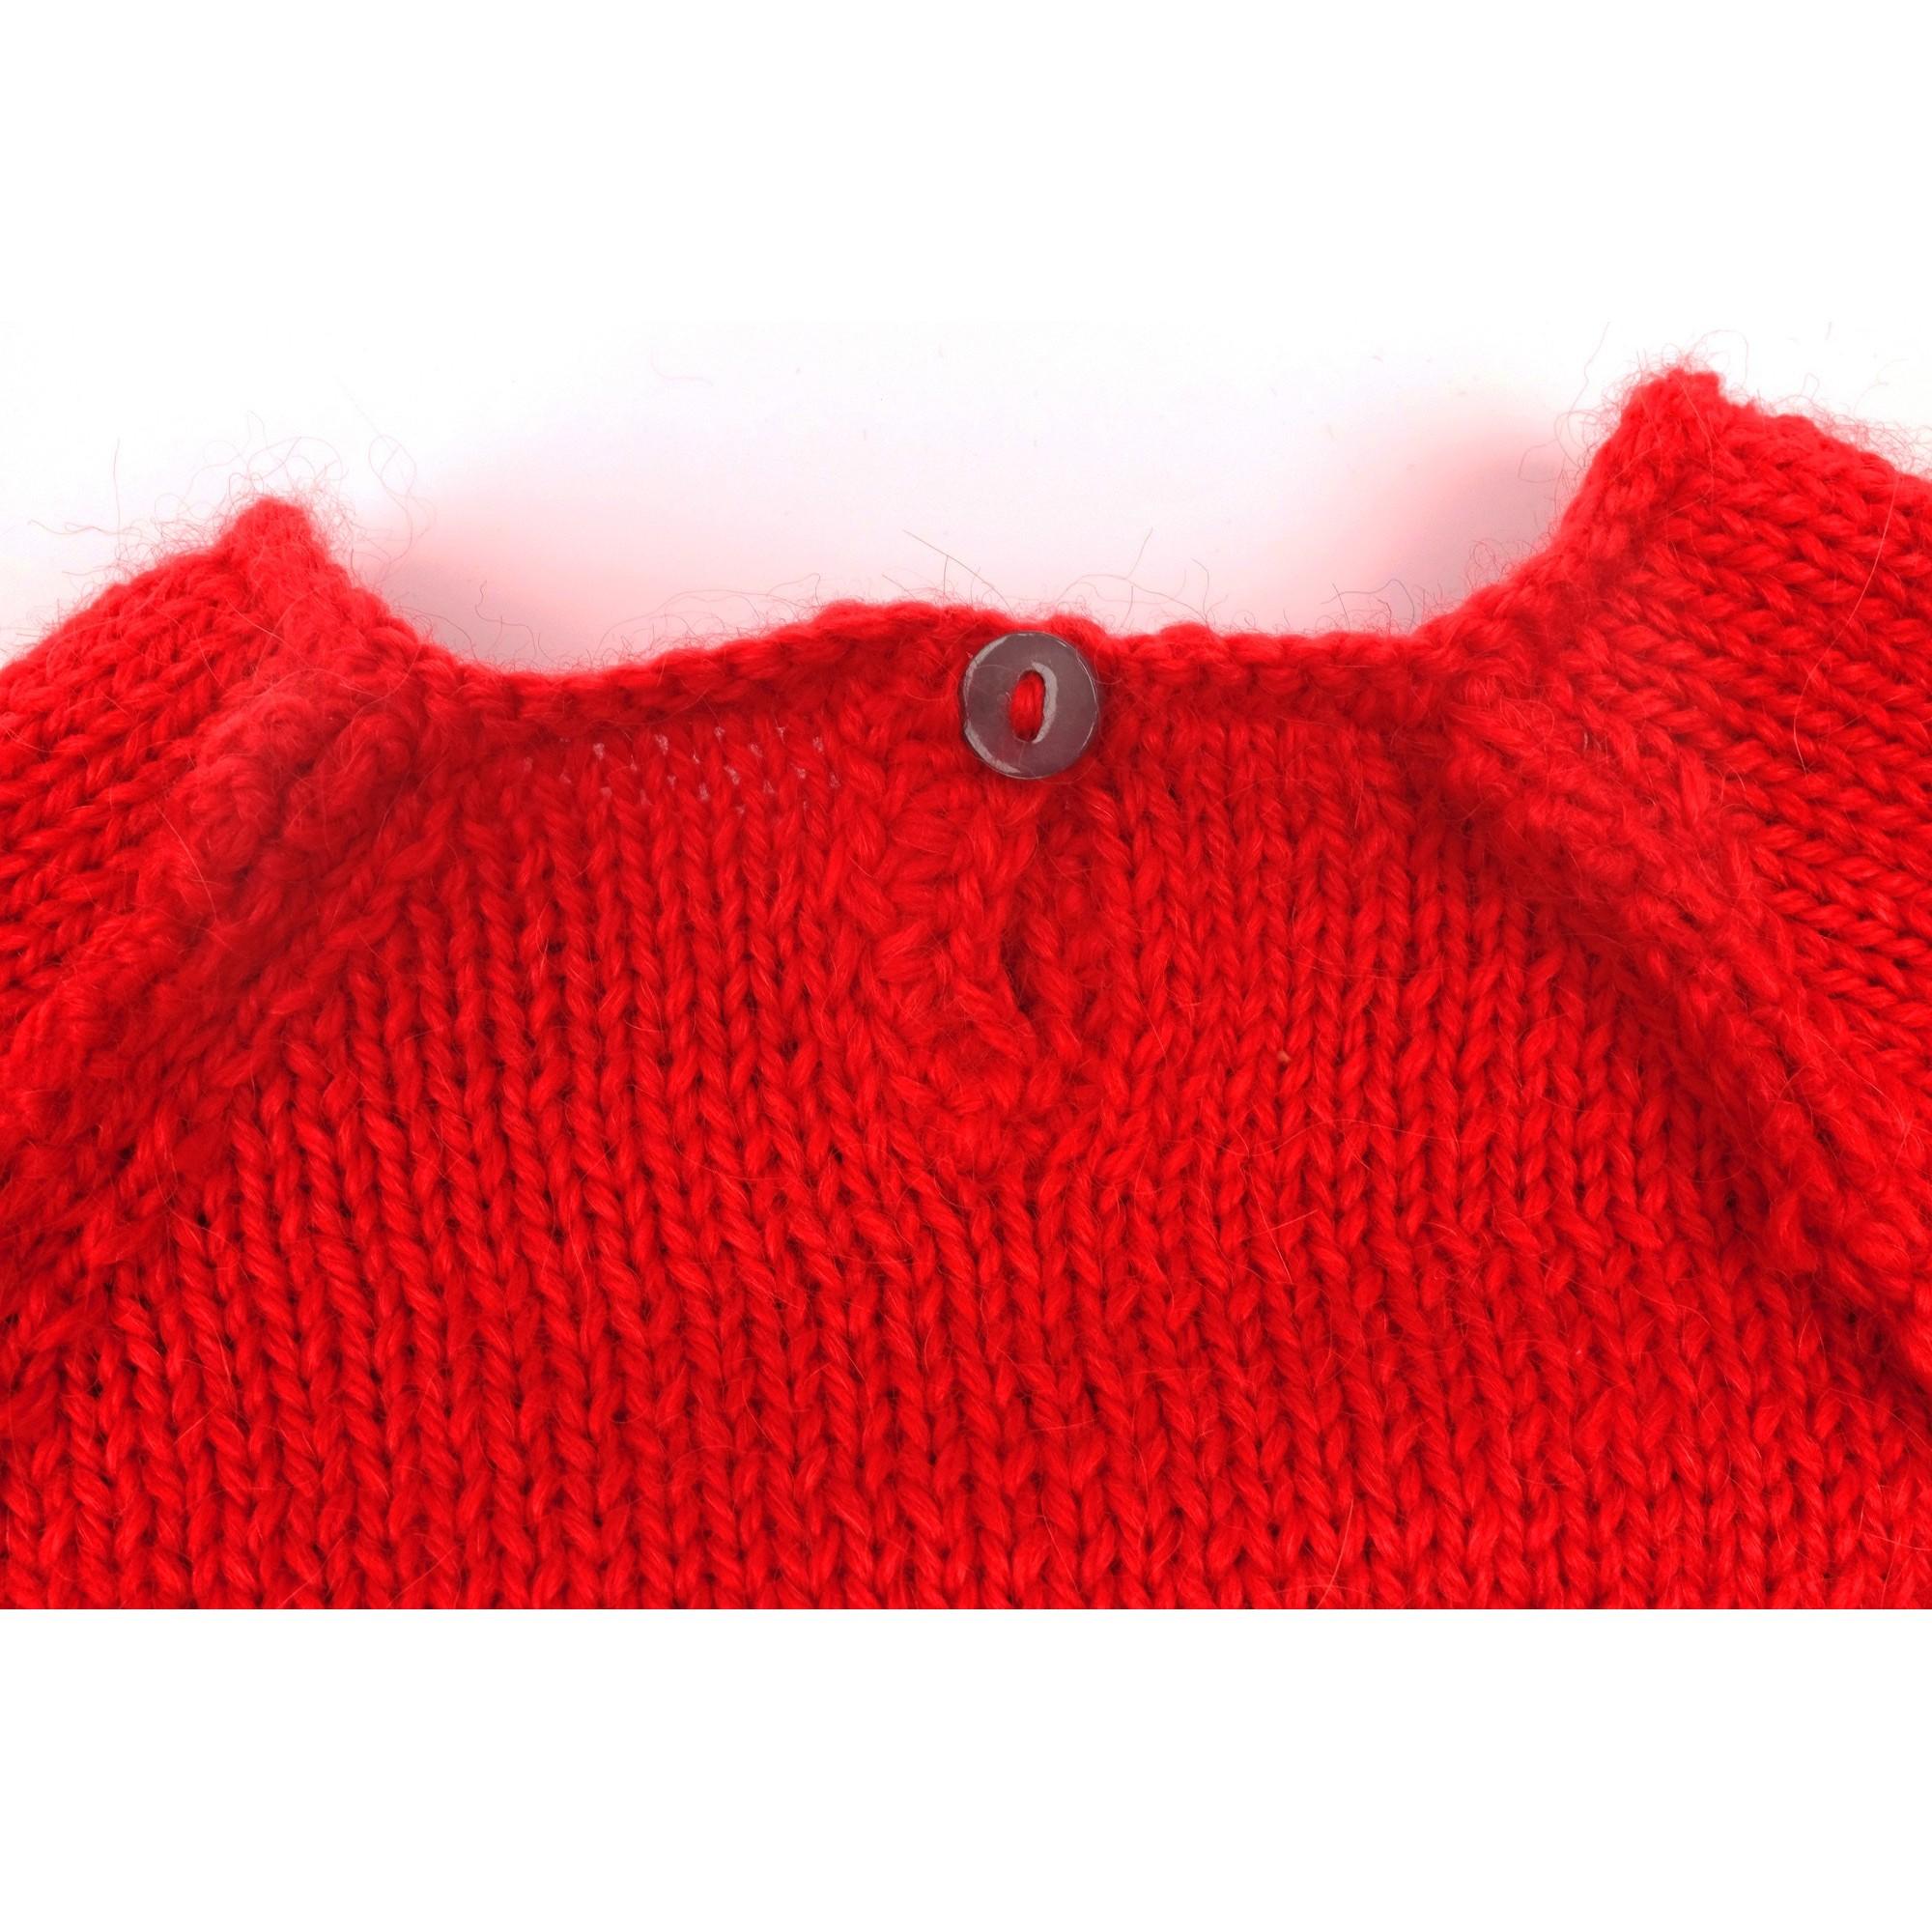 Pull Agénor laine alpaga rouge coeur blanc bébé détail 3